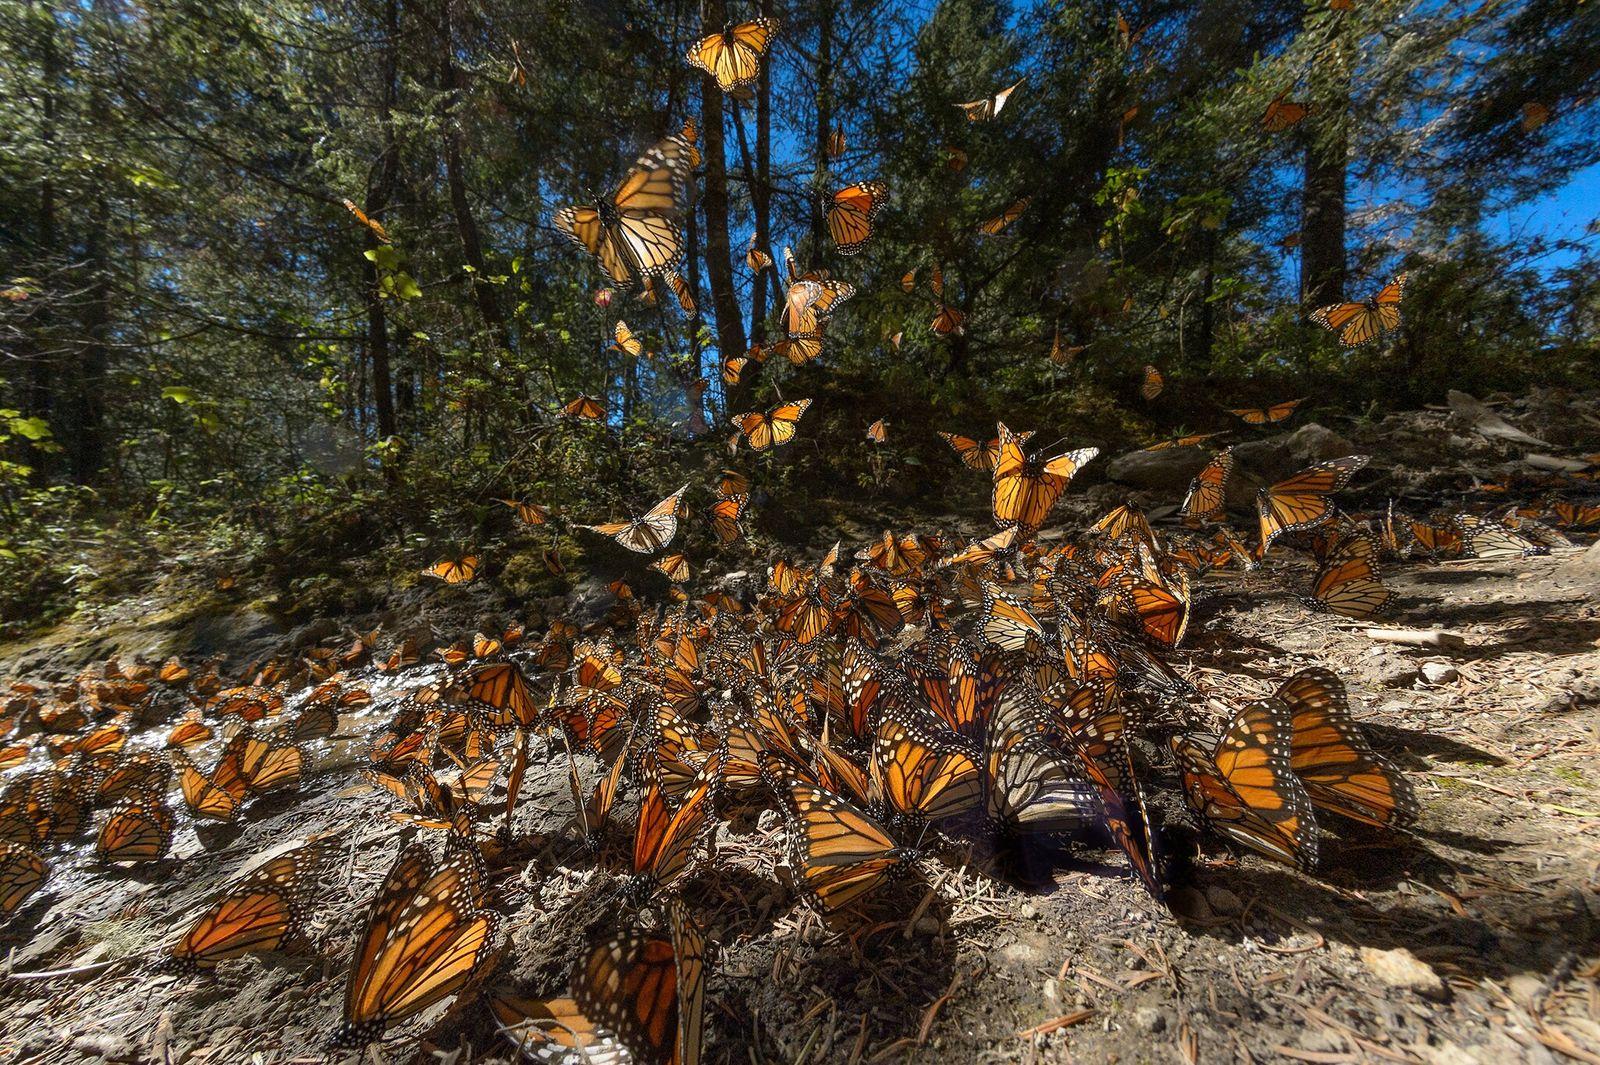 Migrating monarchs gather in Santuario El Rosario in the state of Michoacán in southwestern Mexico. The ...